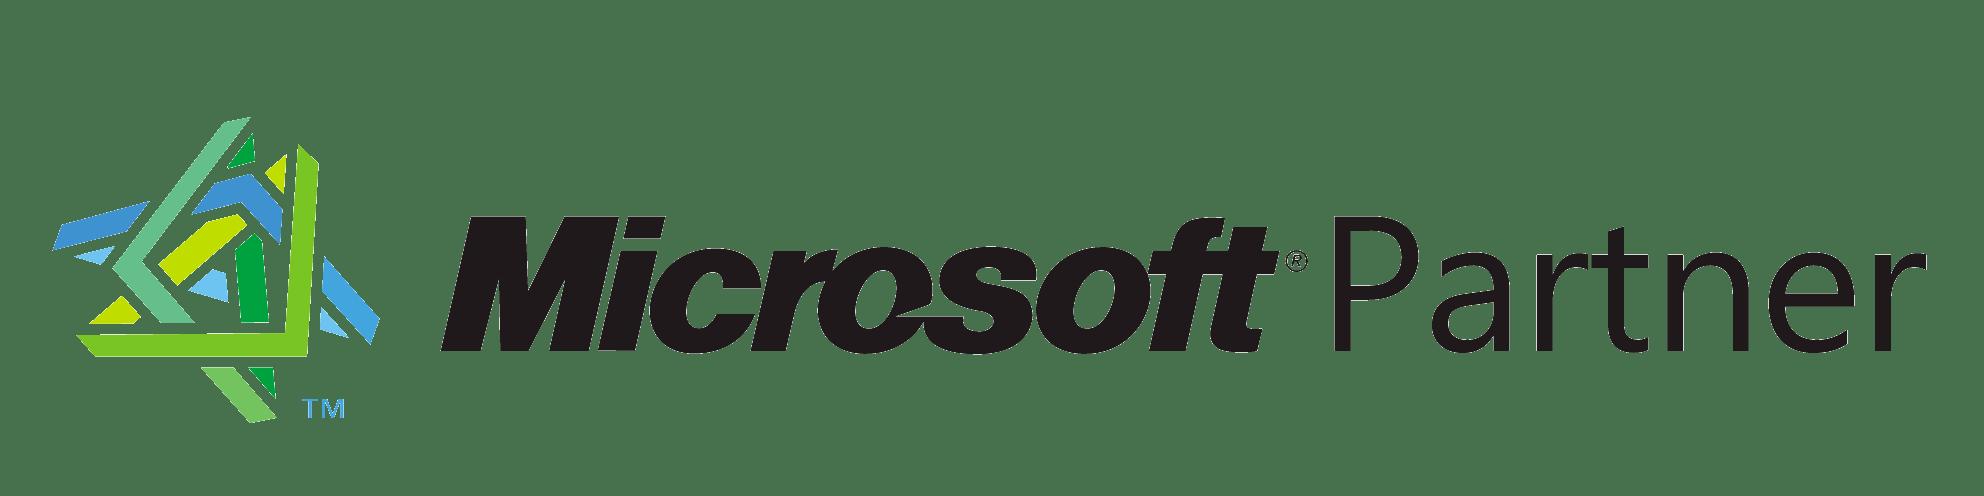 Microsoft Partner Power BI Power Pivot